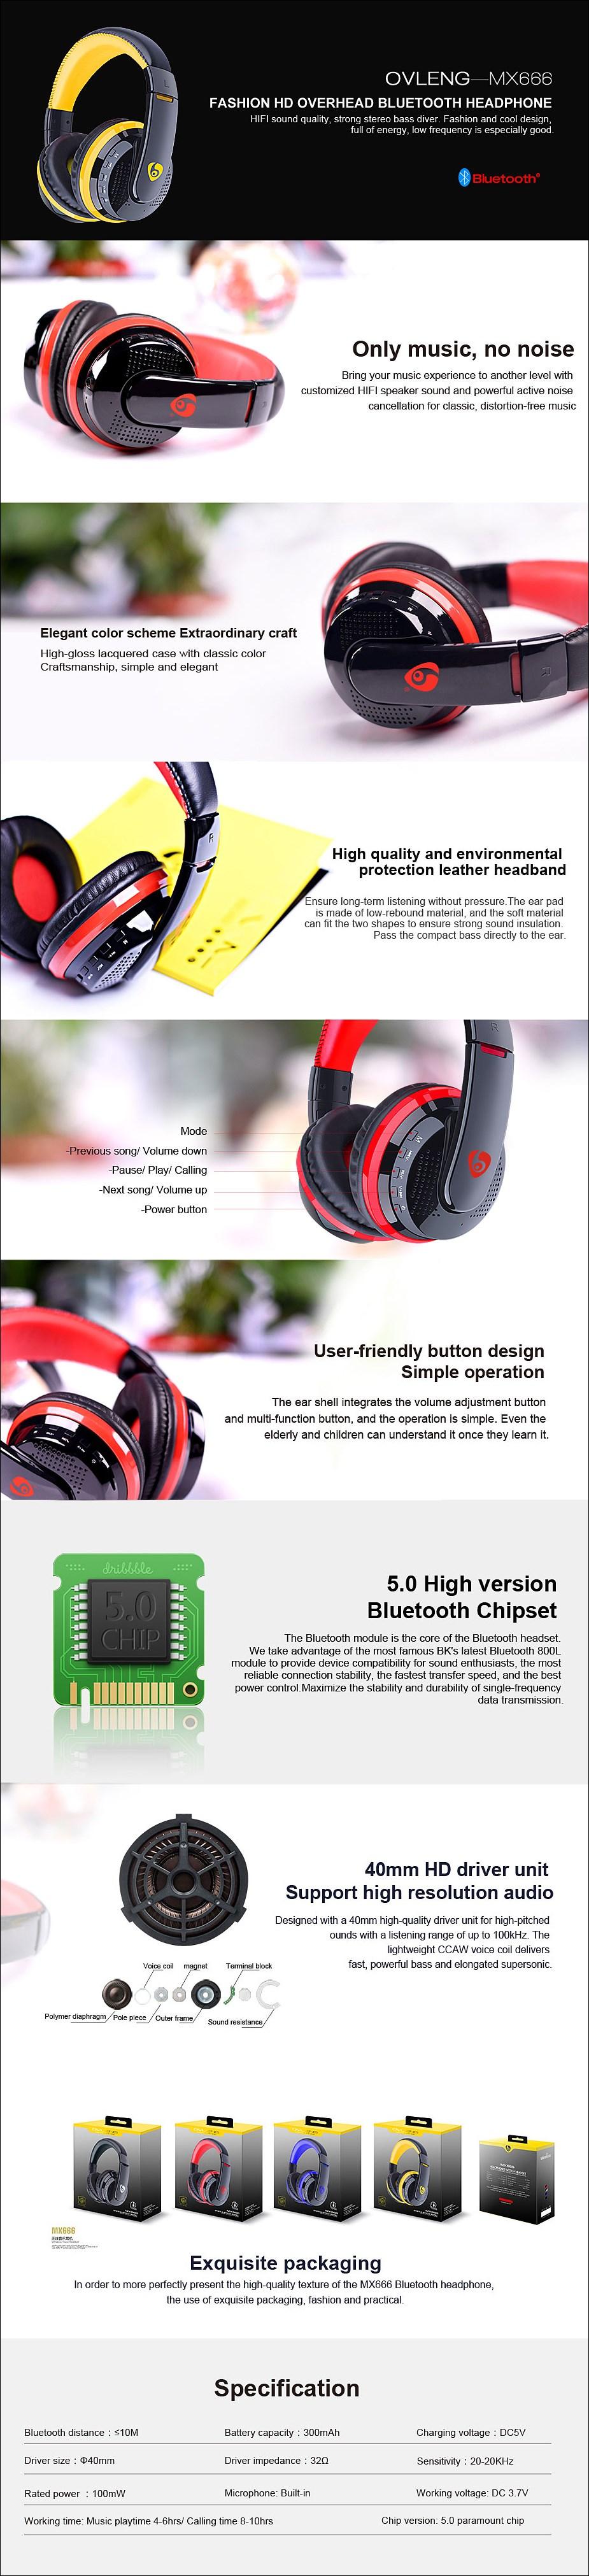 Ovleng MX666 Over-Ear Bluetooth Headphones - Red - Desktop Overview 1